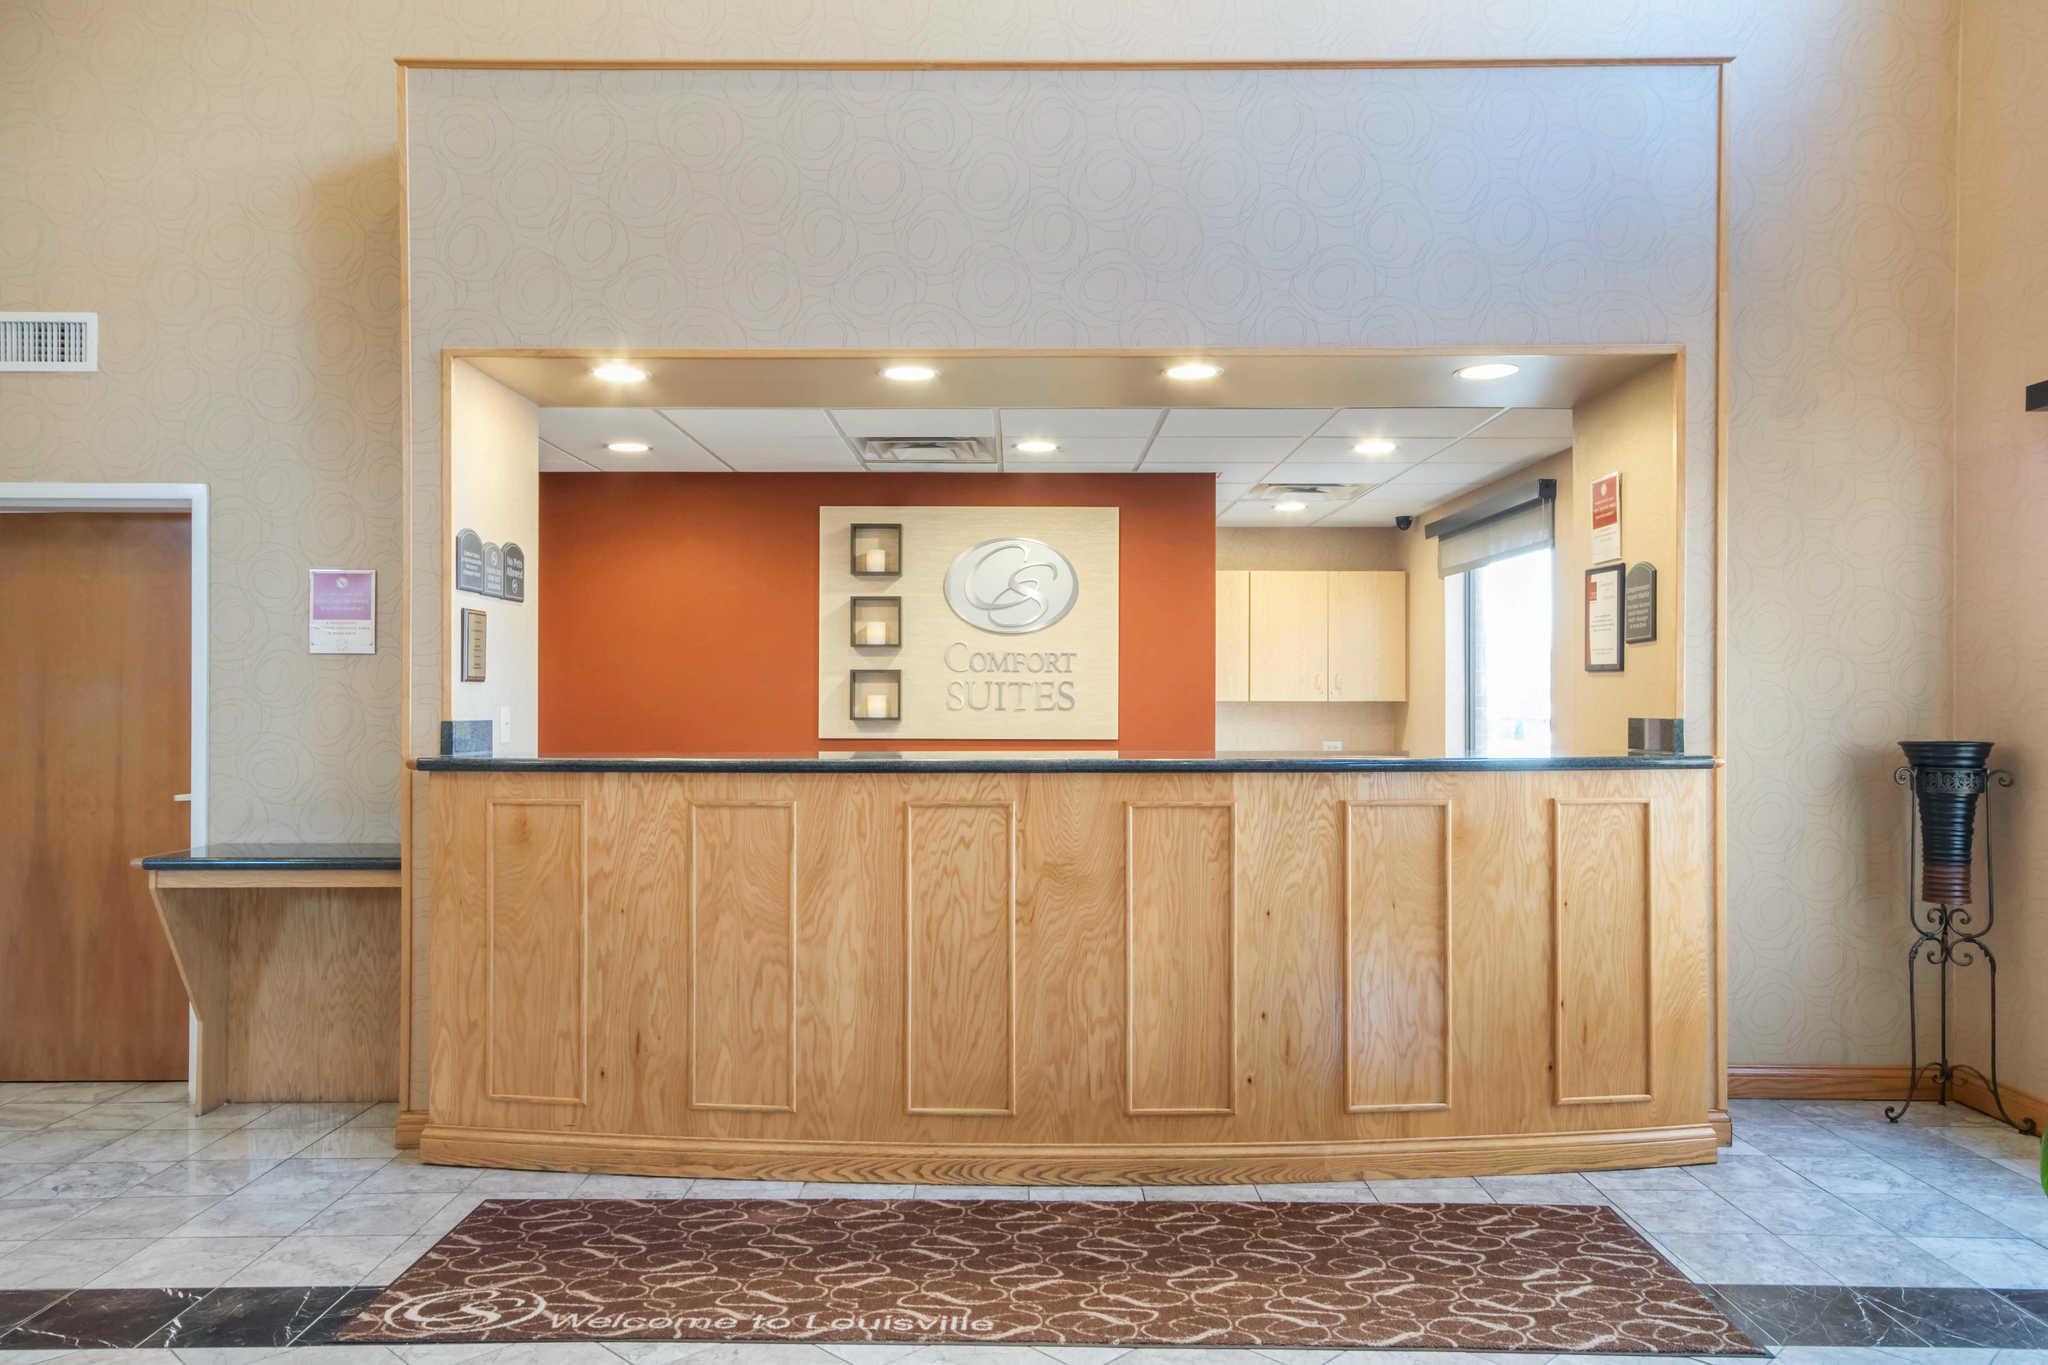 Comfort Suites Airport image 3